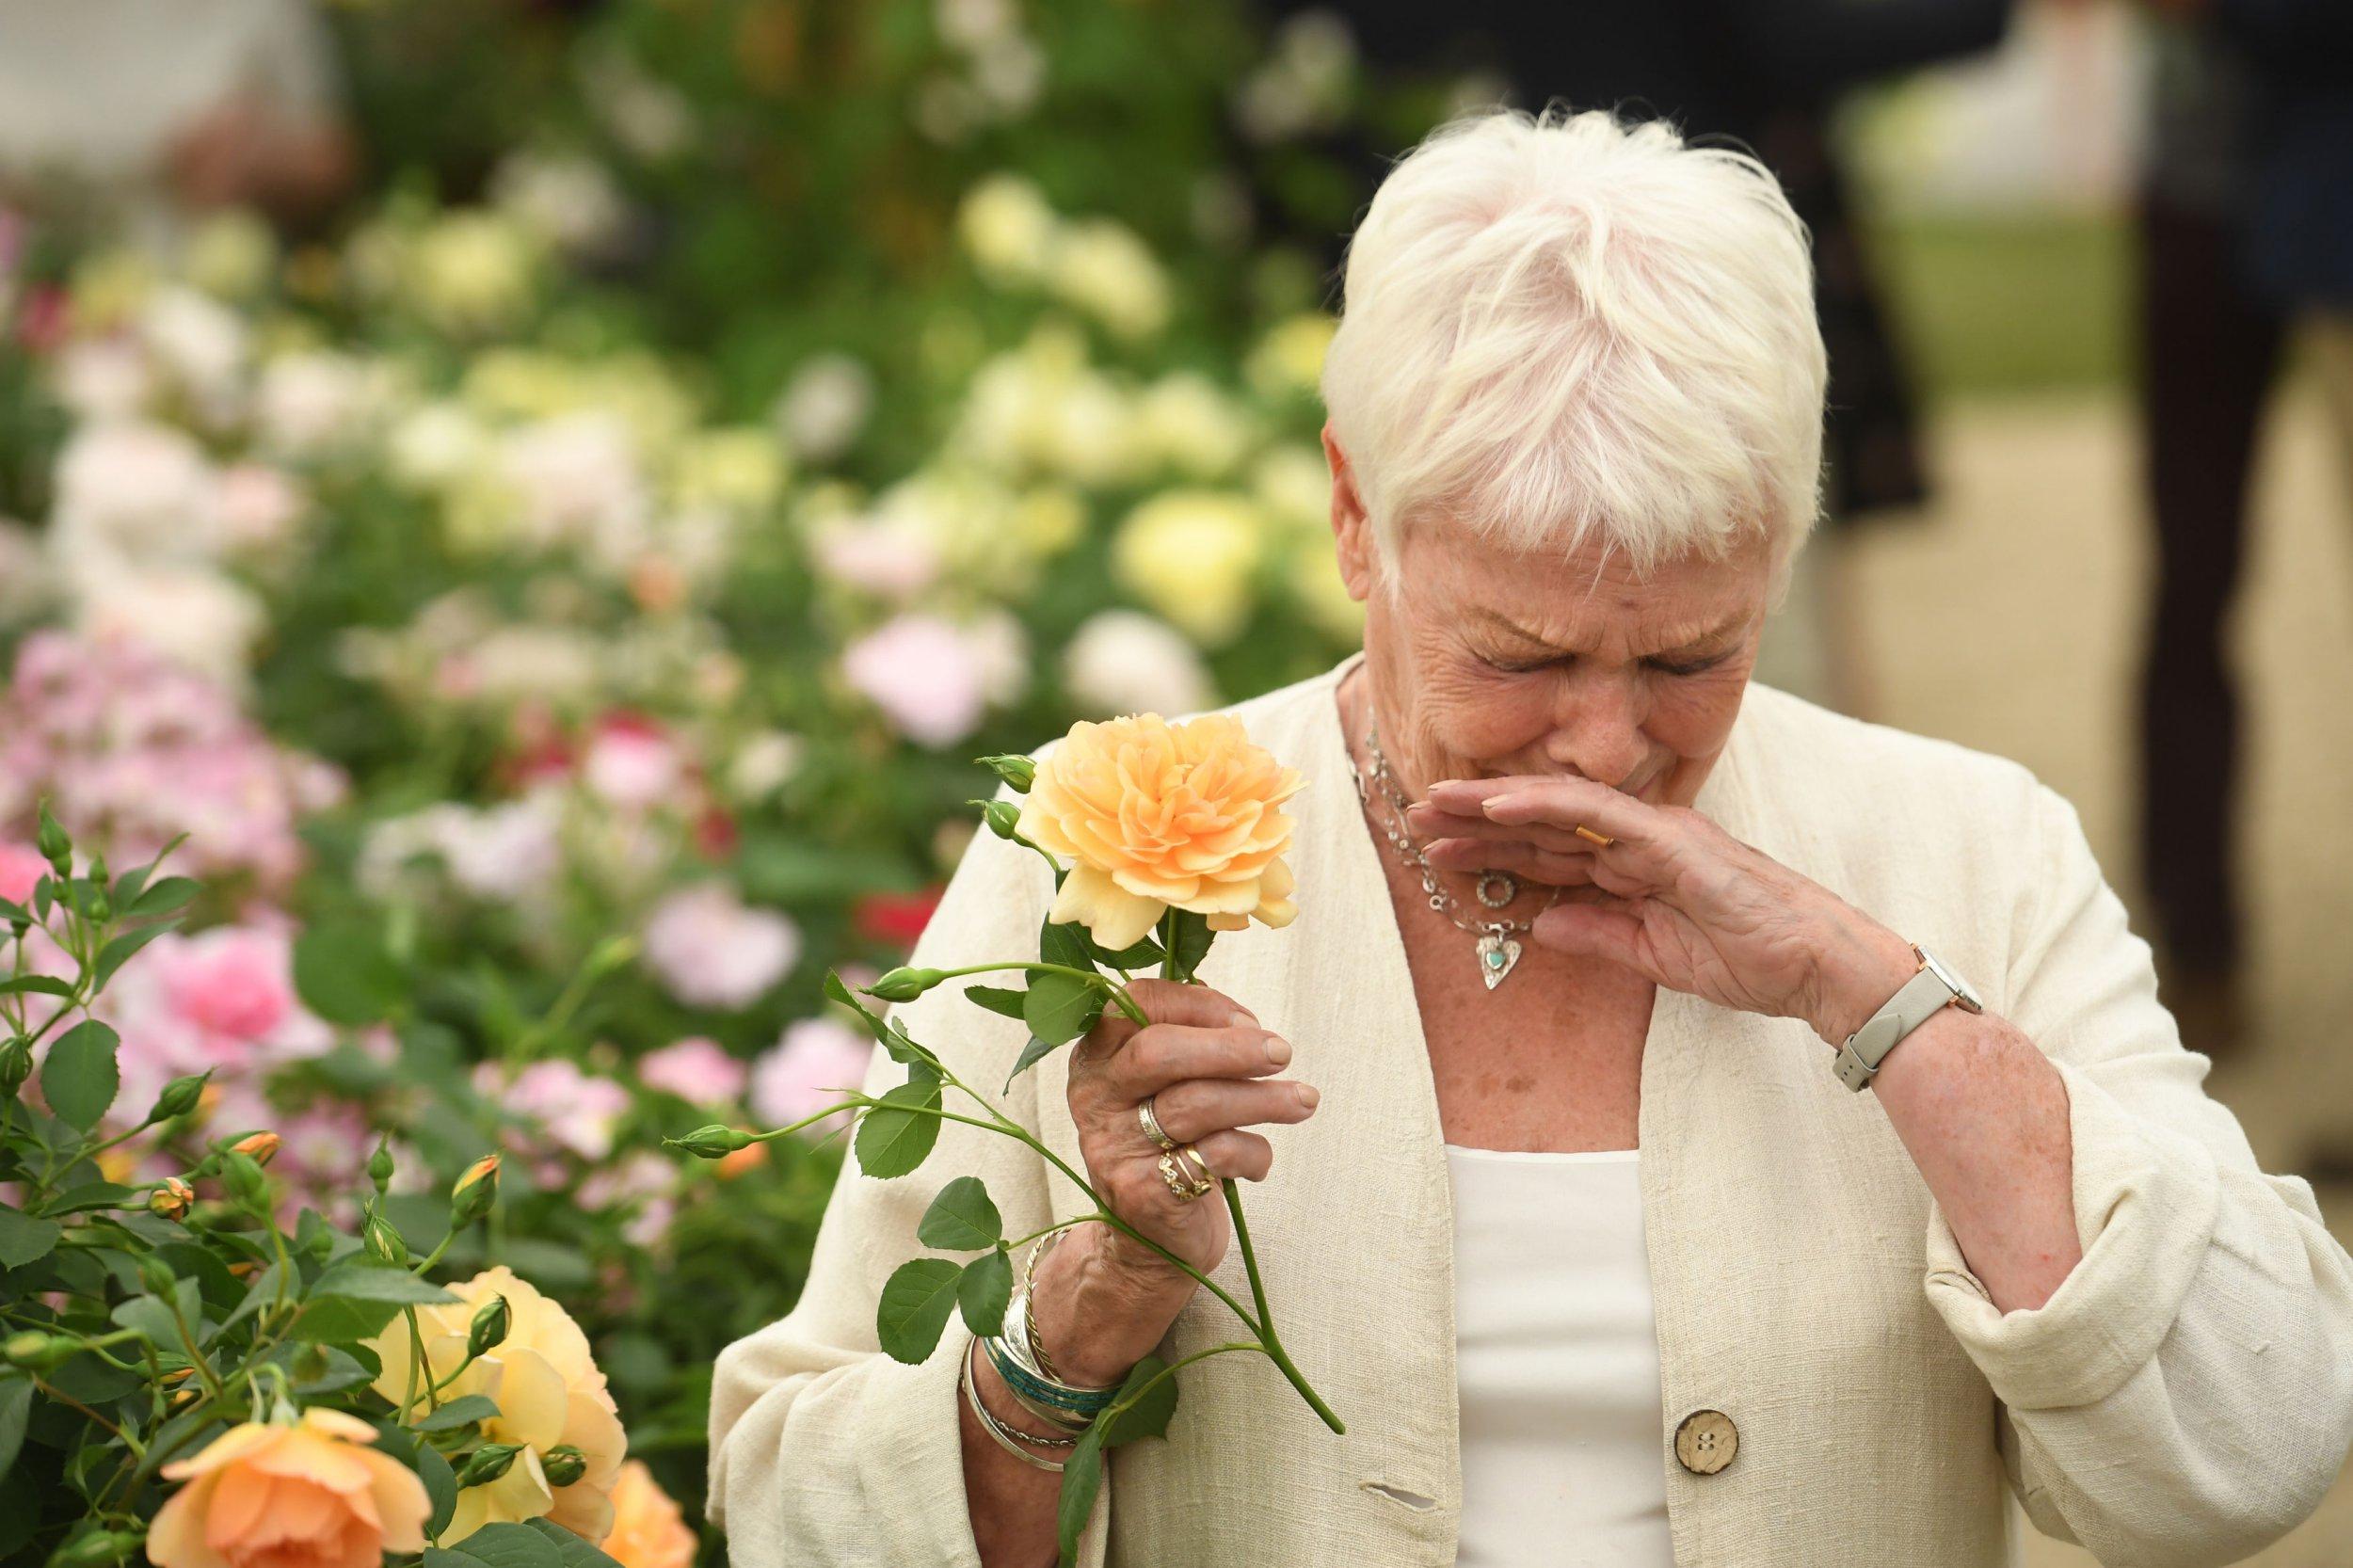 Judi Dench sneezes after sniffing on rose named after her at Chelsea Flower Show